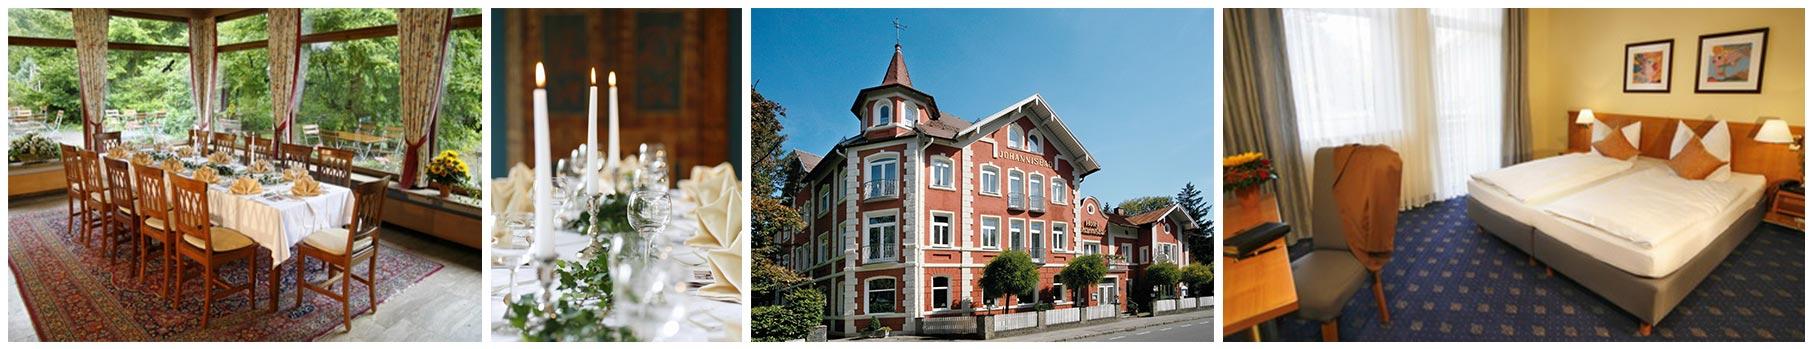 Hotel-Bad-Johannisbad-Impressionen